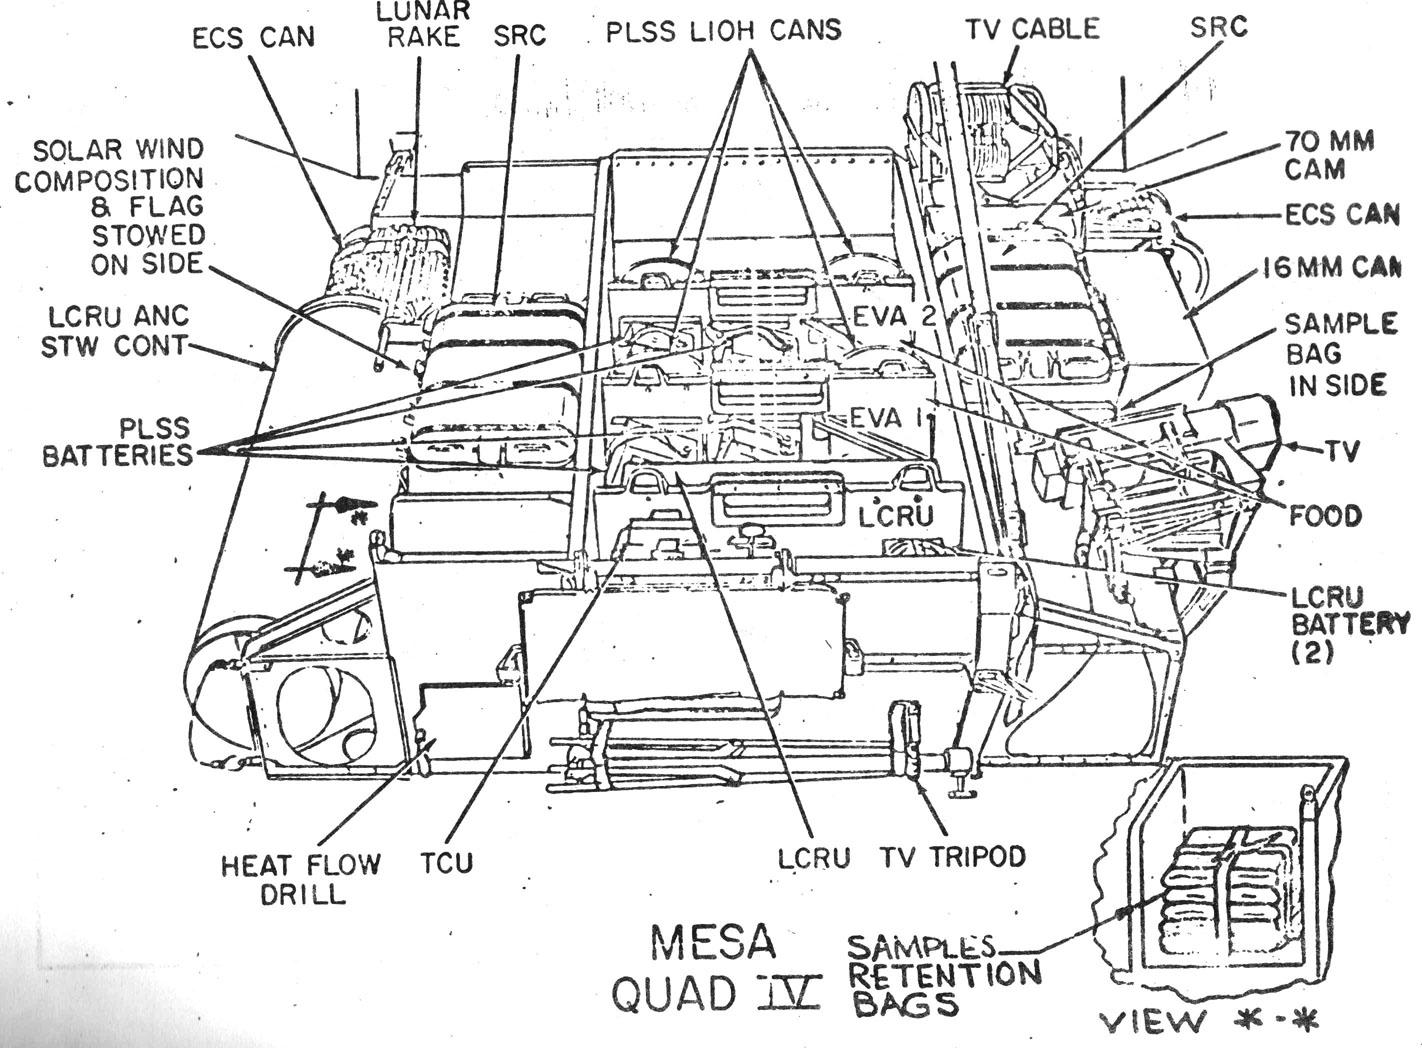 land rover freelander engine diagram stihl ms 260 pro parts deploying the lunar roving vehicle